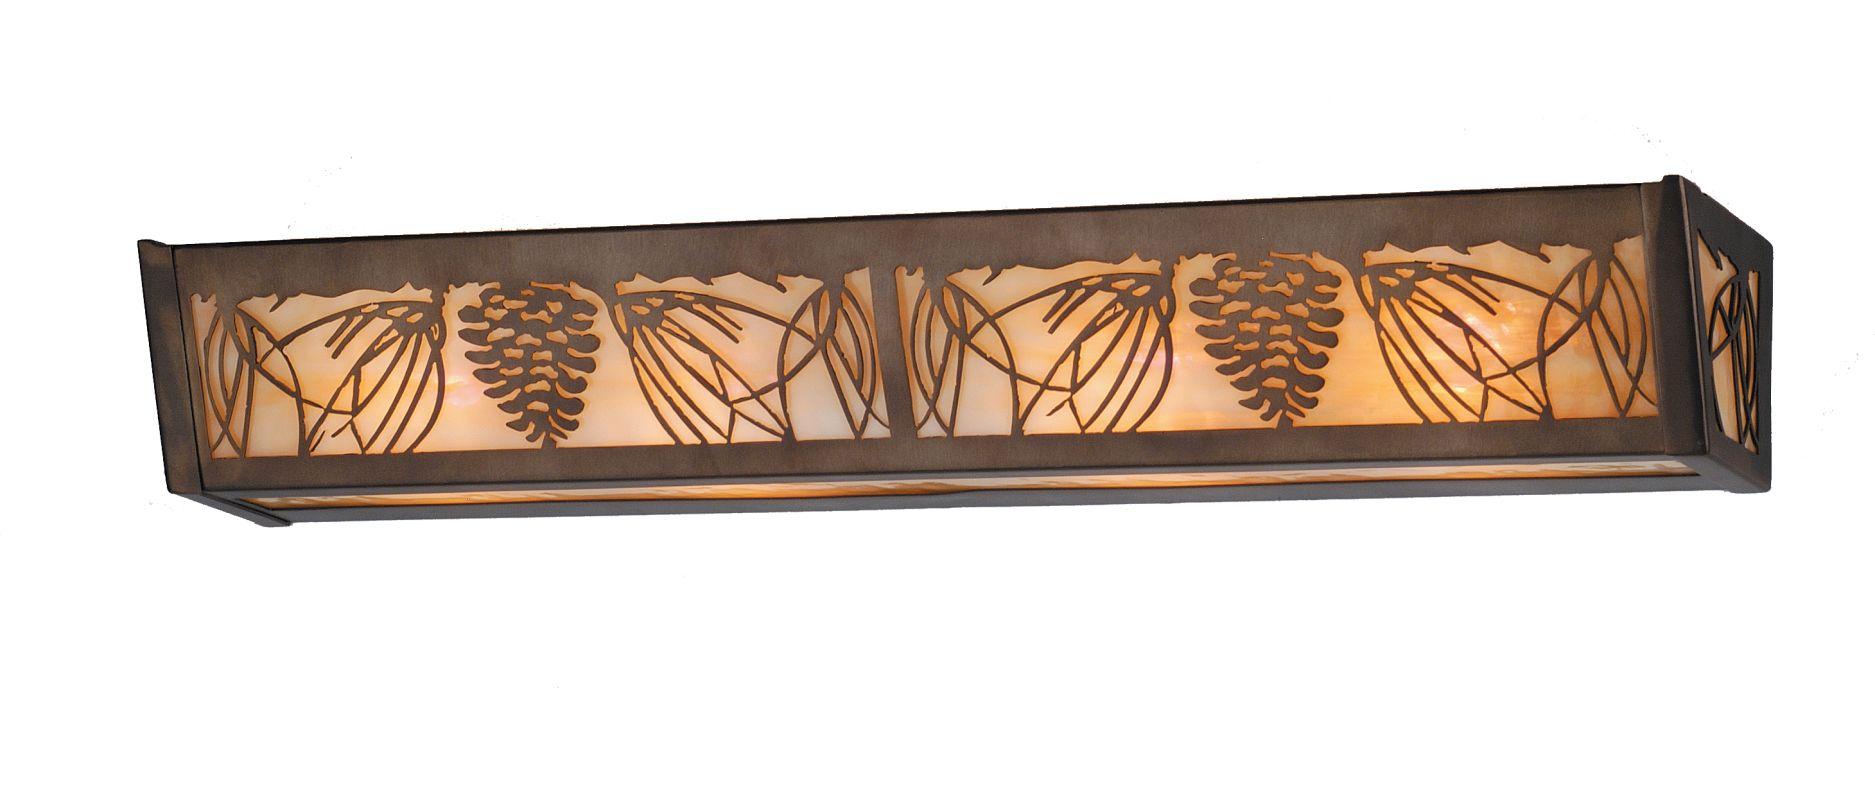 "Meyda Tiffany 70492 30"" W Mountain Pine Vanity Light Antique Copper"